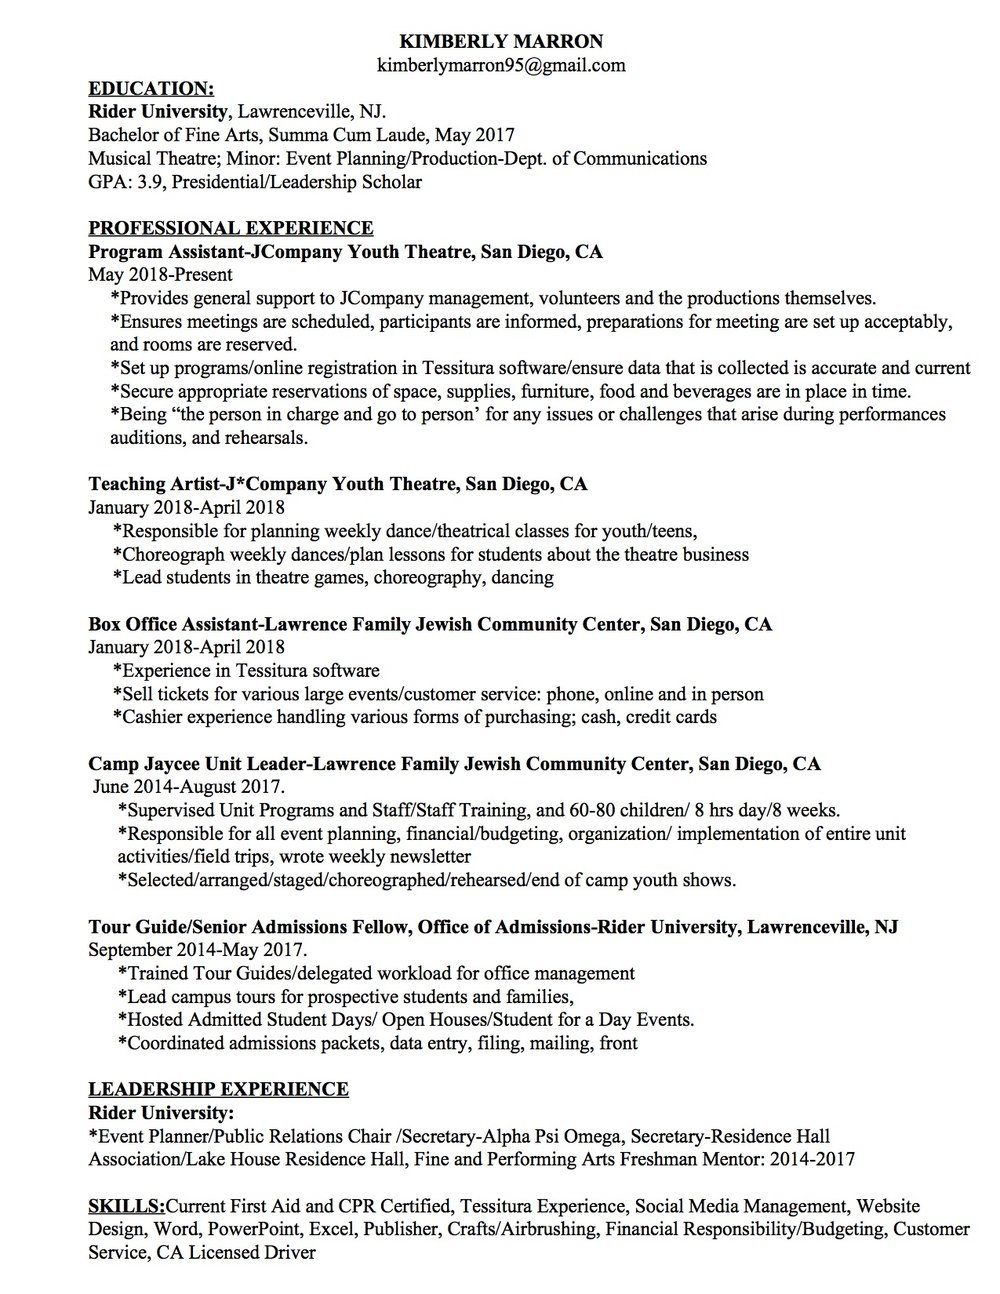 Kimberly Website Prof Resume.jpg